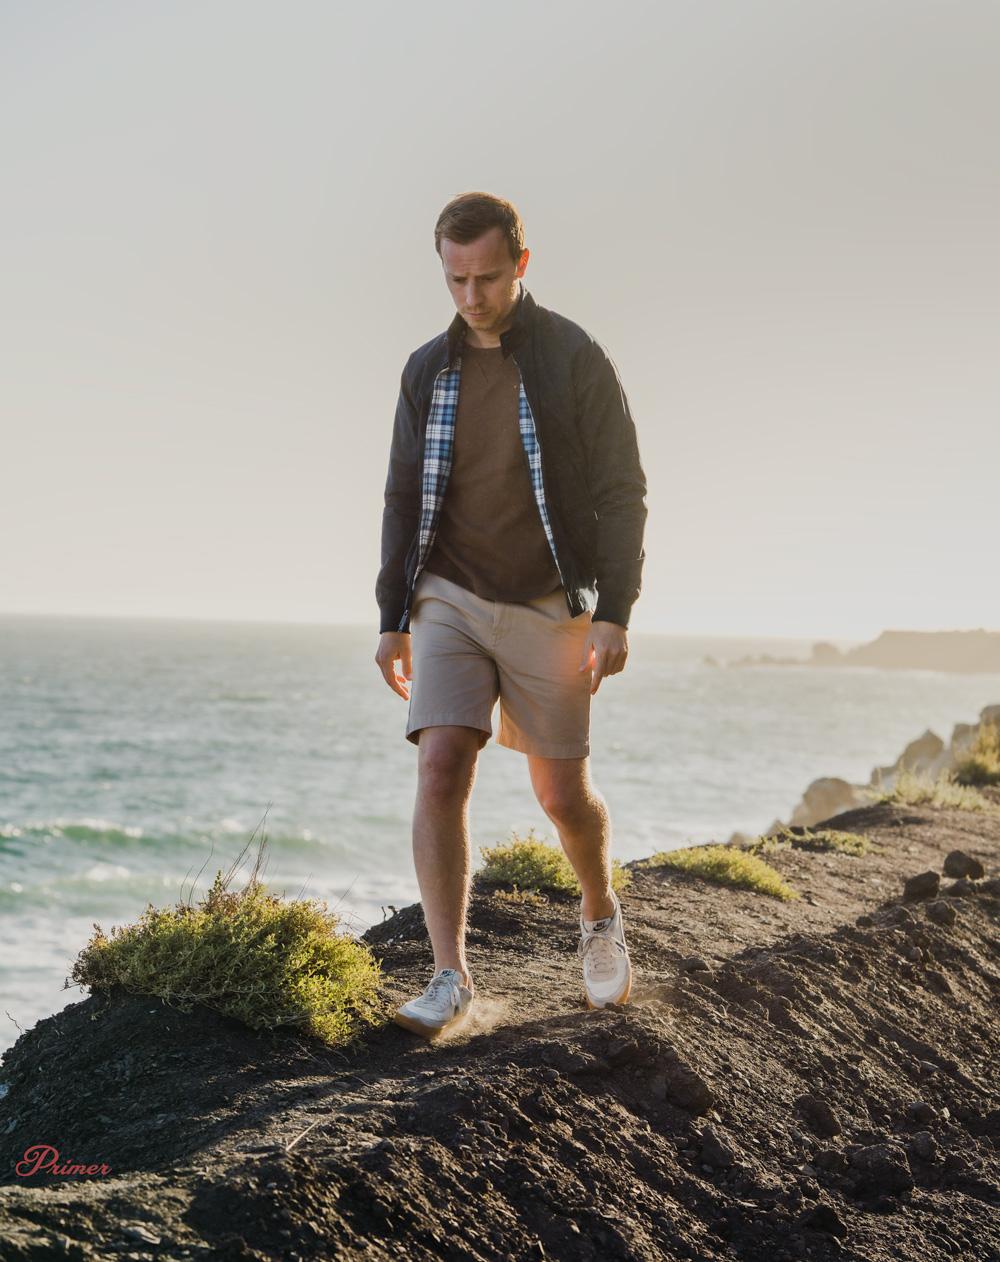 men summer fashion inspiration harrington jacket chino shorts beach